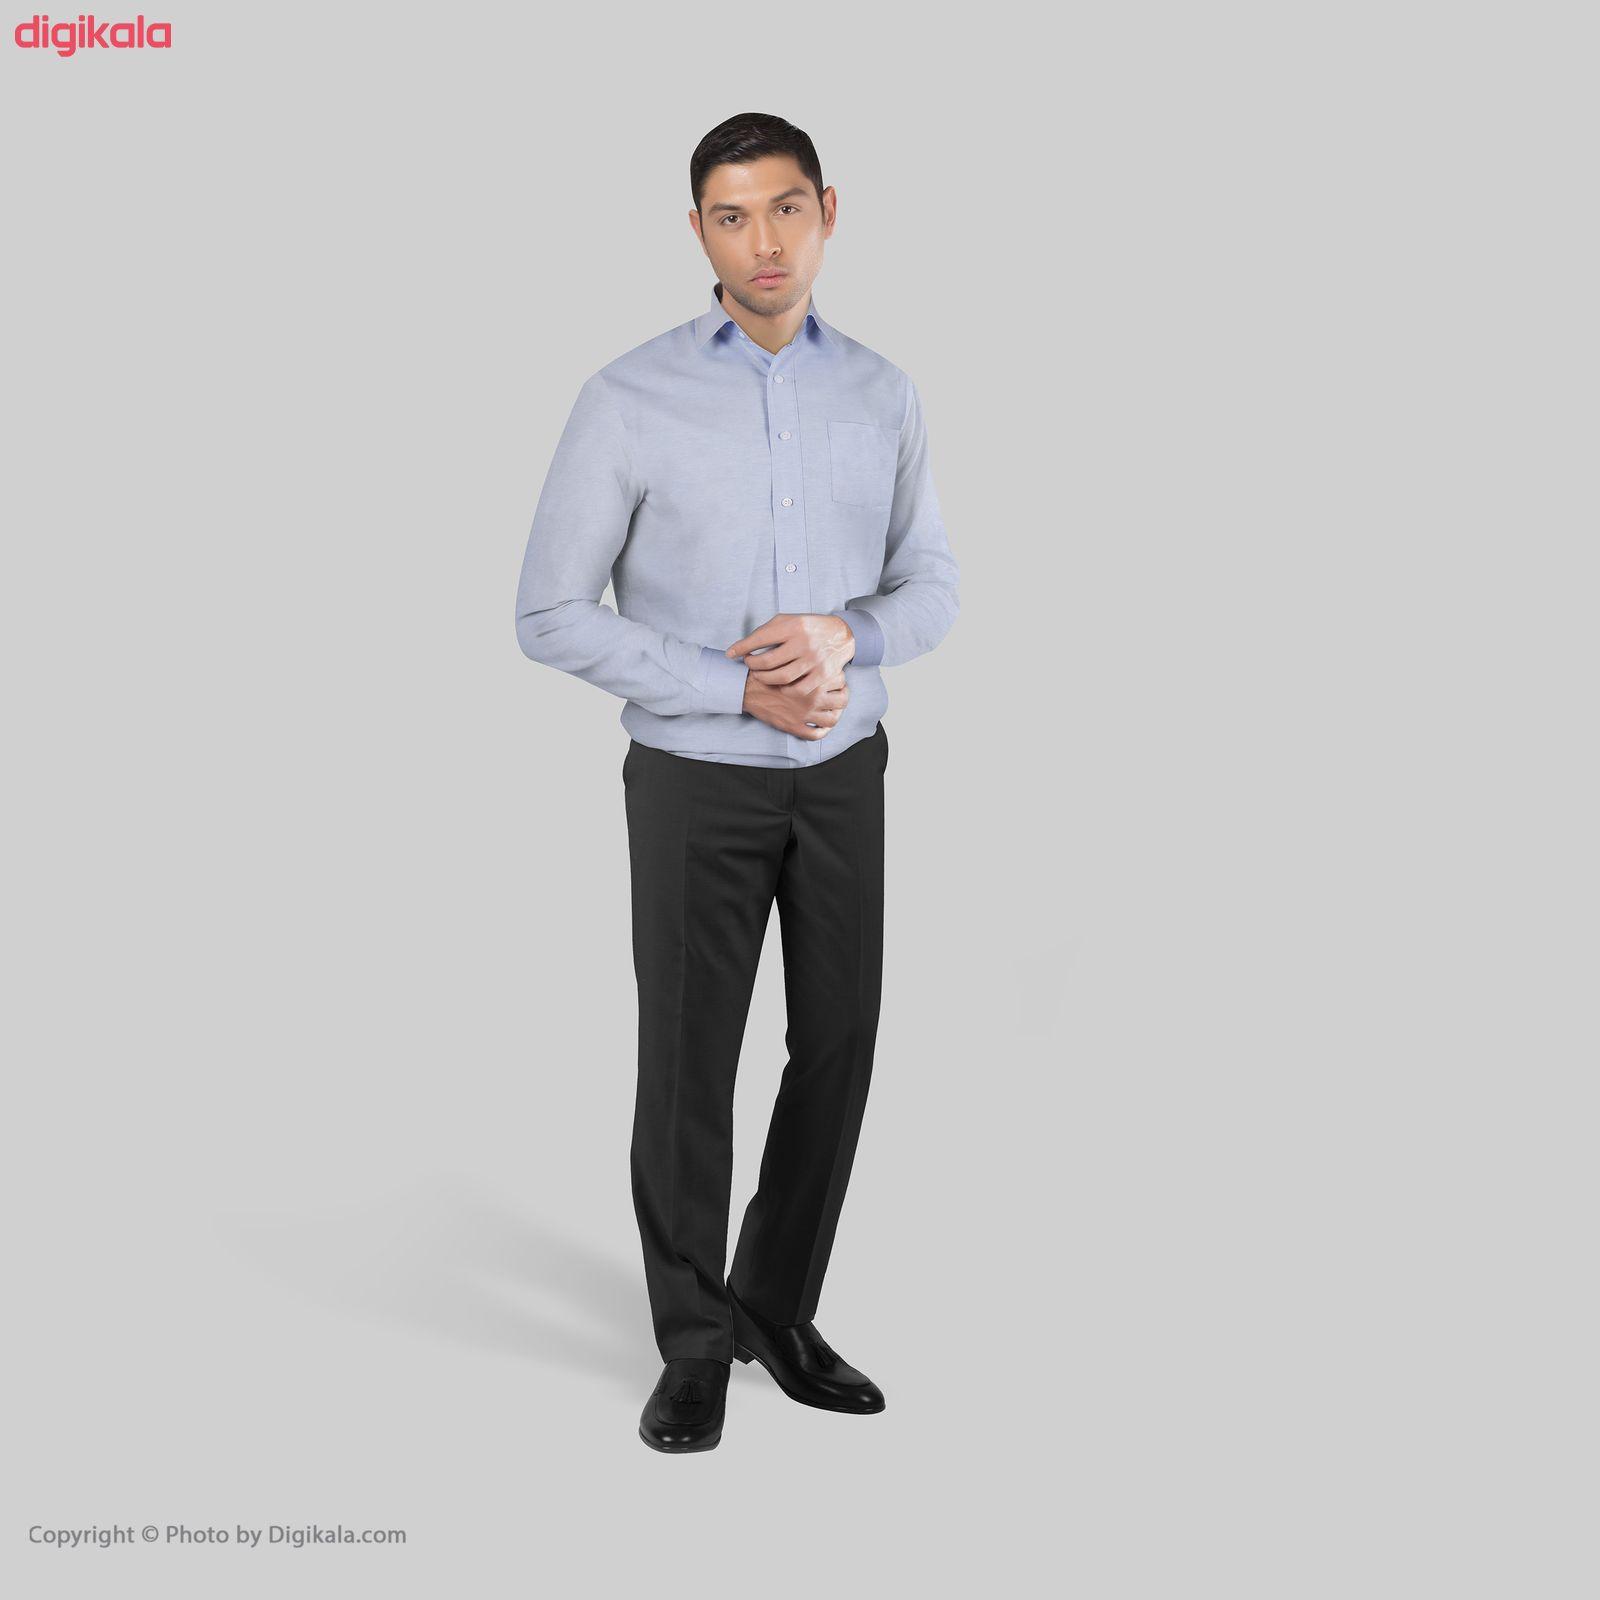 پیراهن آستین بلند مردانه ناوالس مدل NOx8020-BL main 1 1